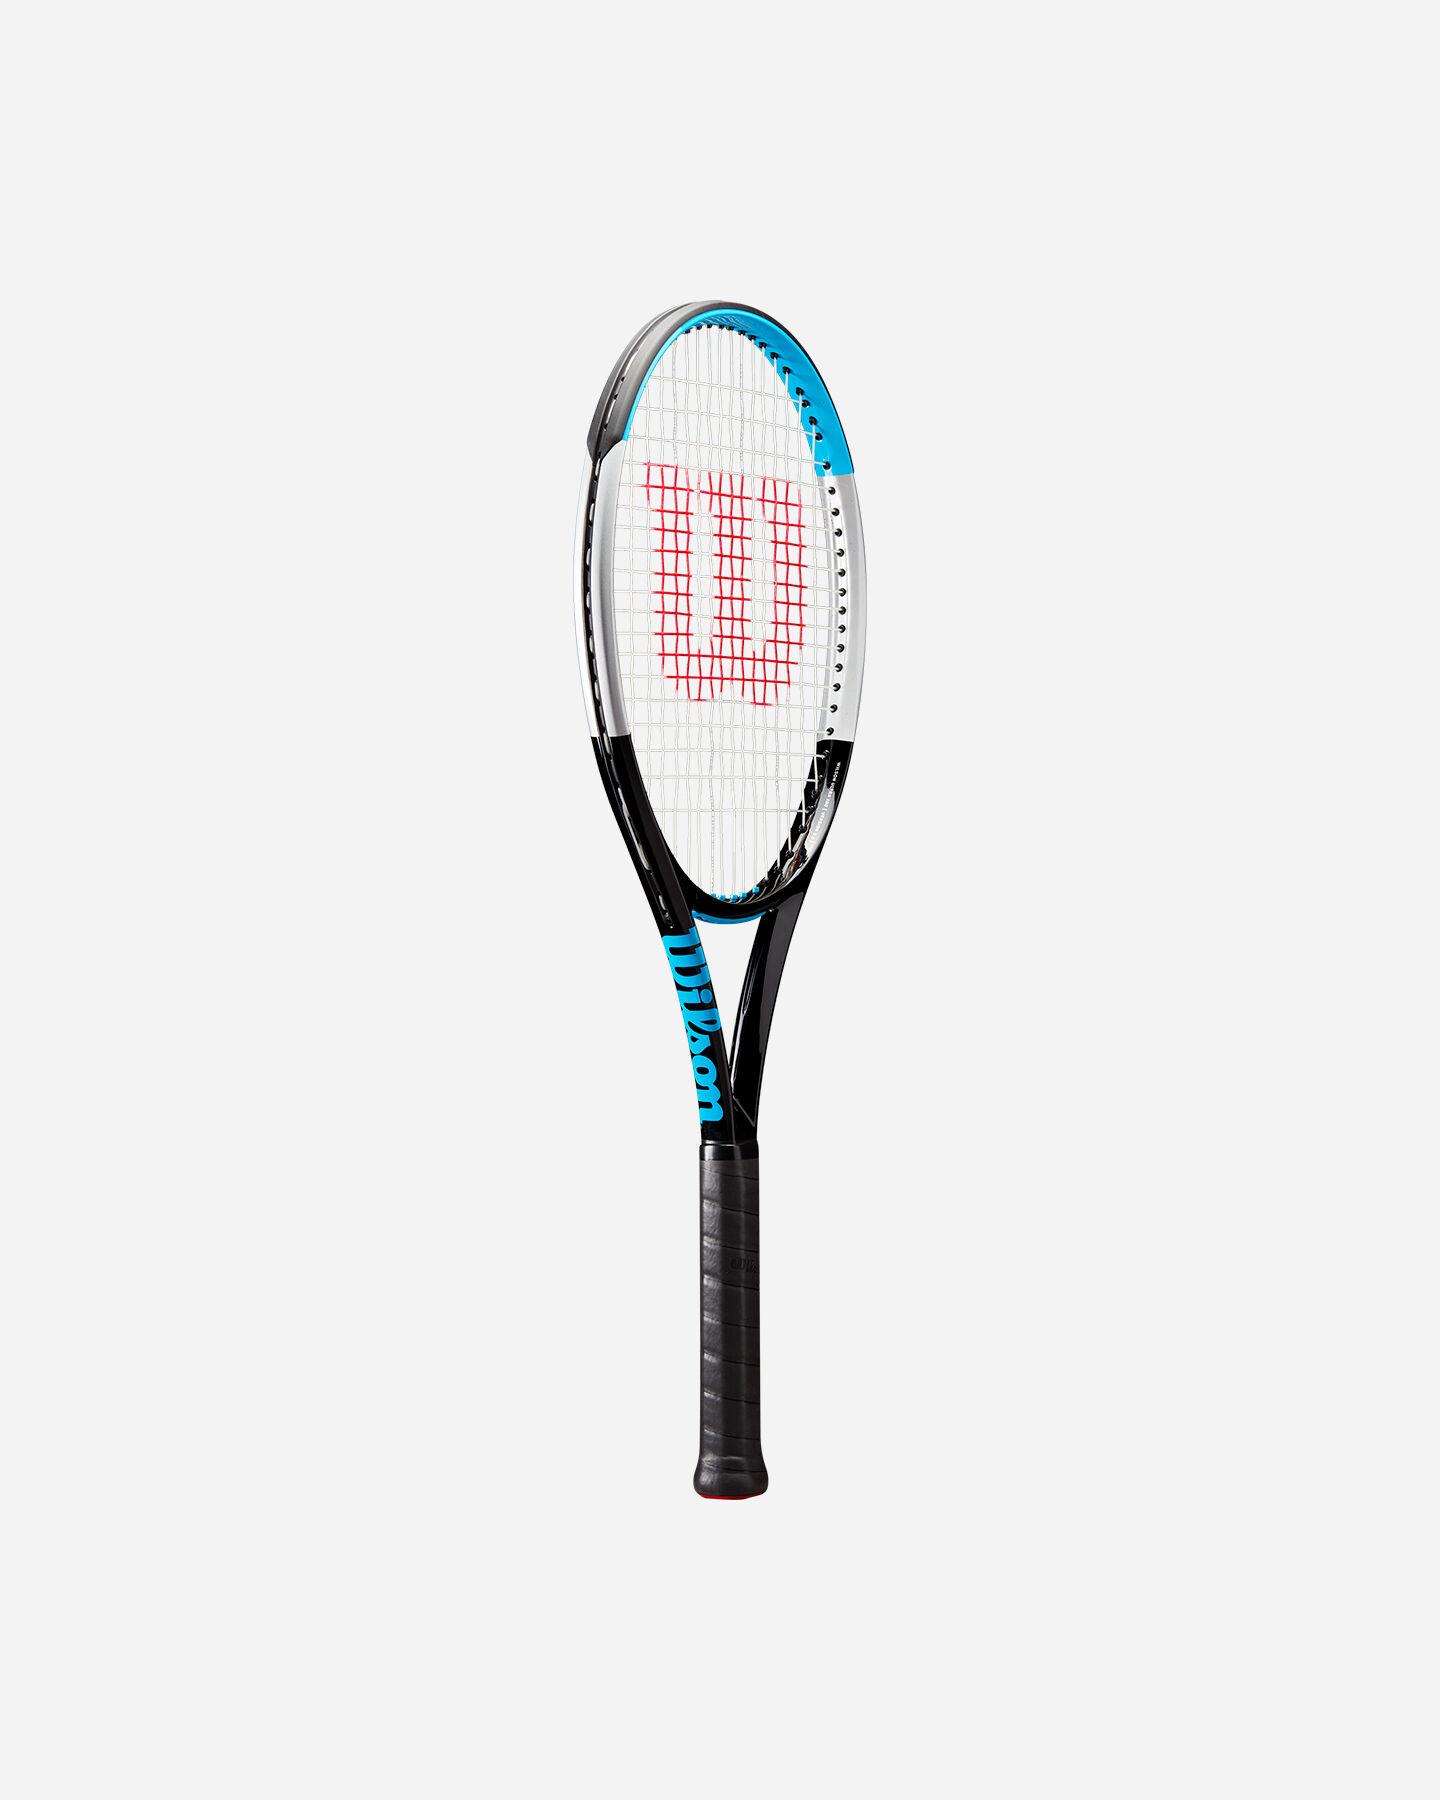 Telaio tennis WILSON ULTRA 100 V3.0 300GR S5245410 scatto 2